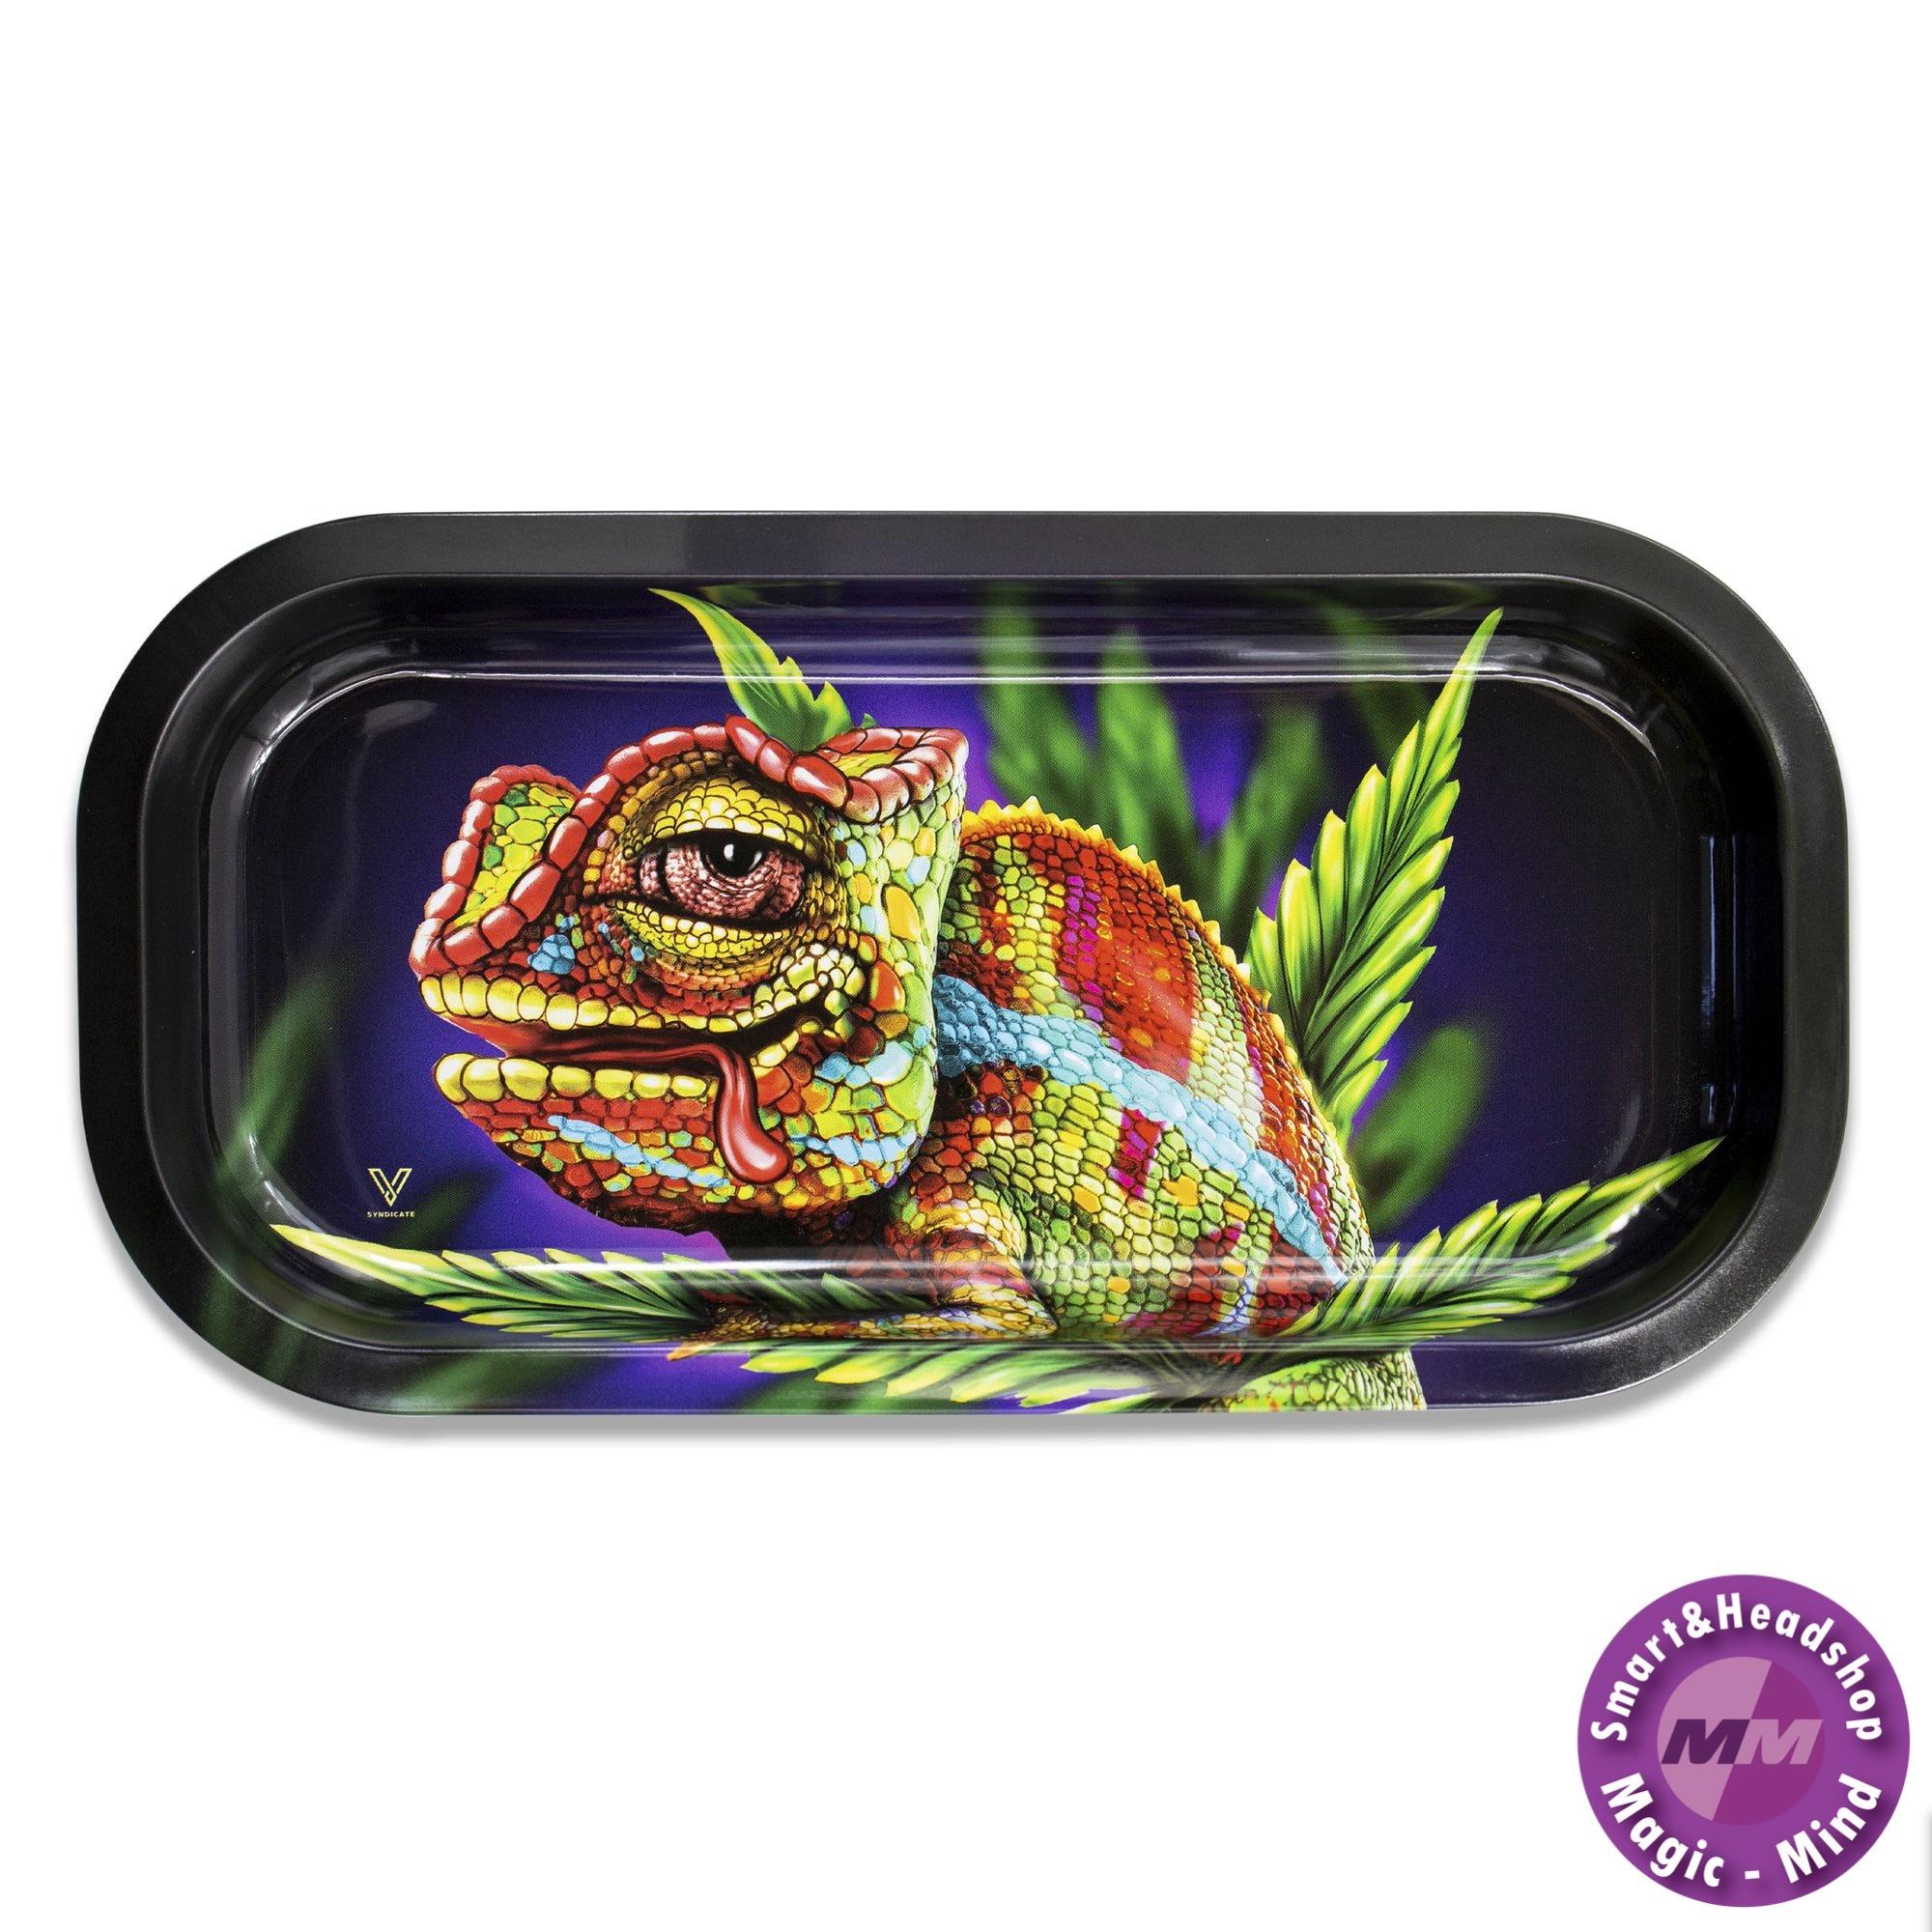 Chameleon Rolling Tray (L27XW16).